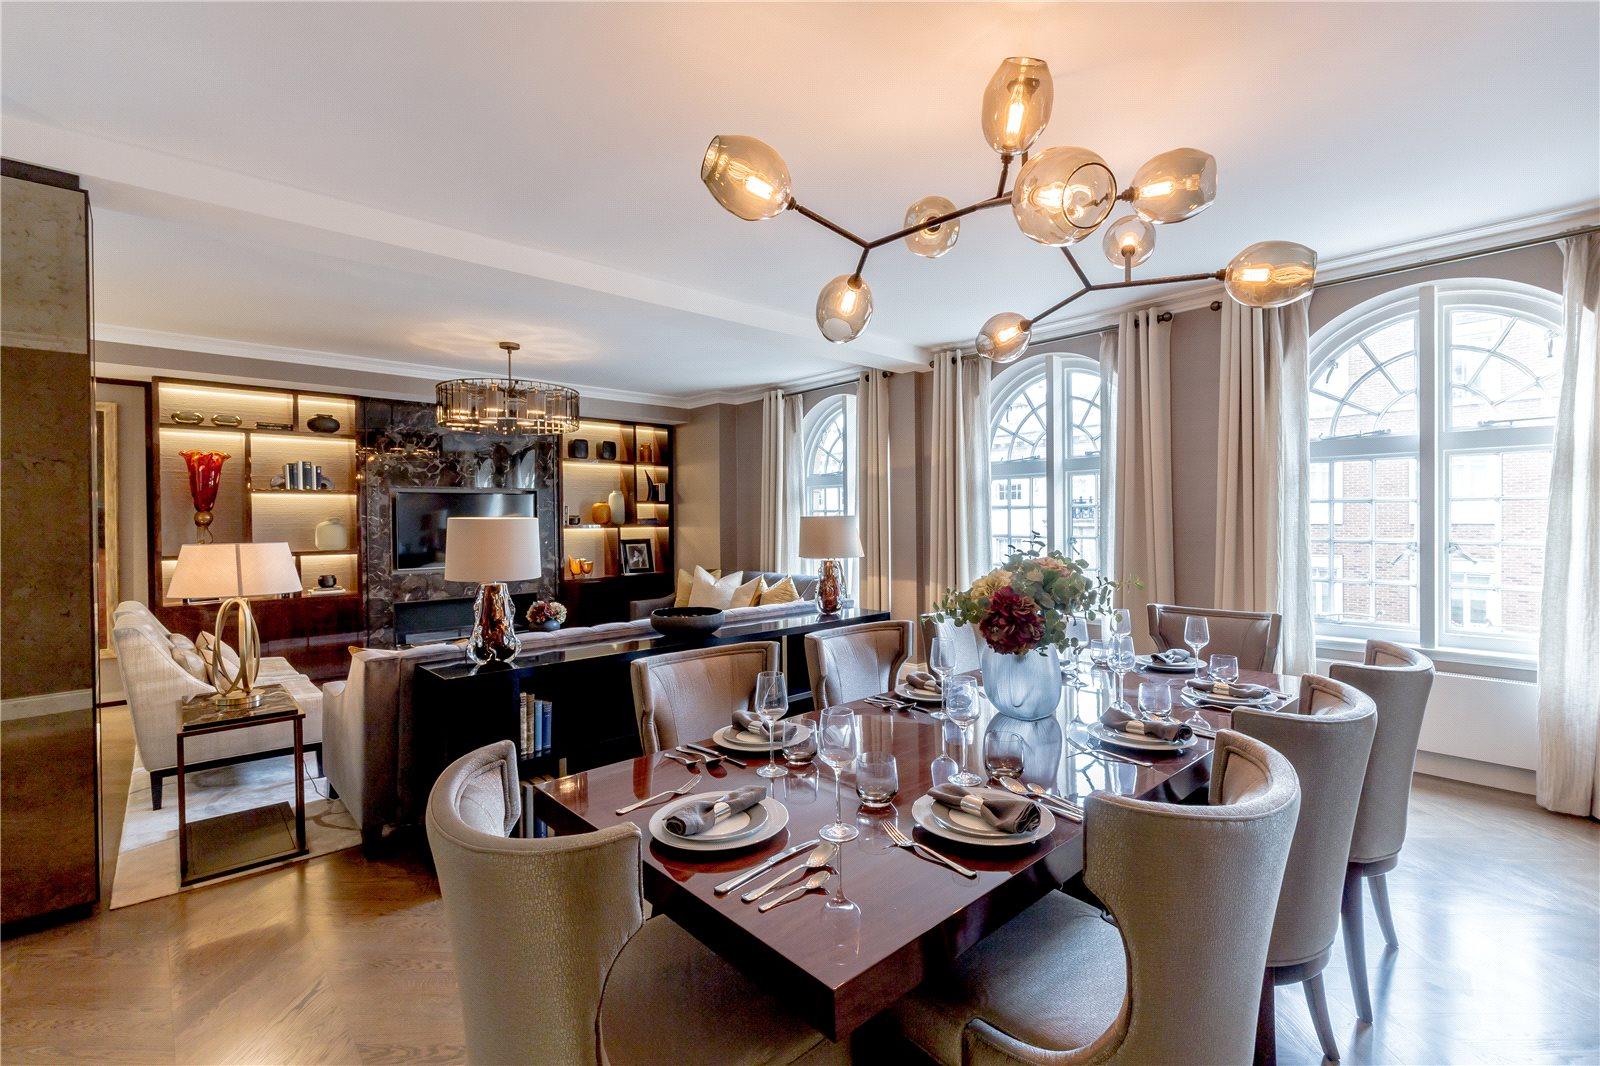 Appartamenti per Vendita alle ore Hugo House, 177 Sloane Street, London, SW1X London, Inghilterra